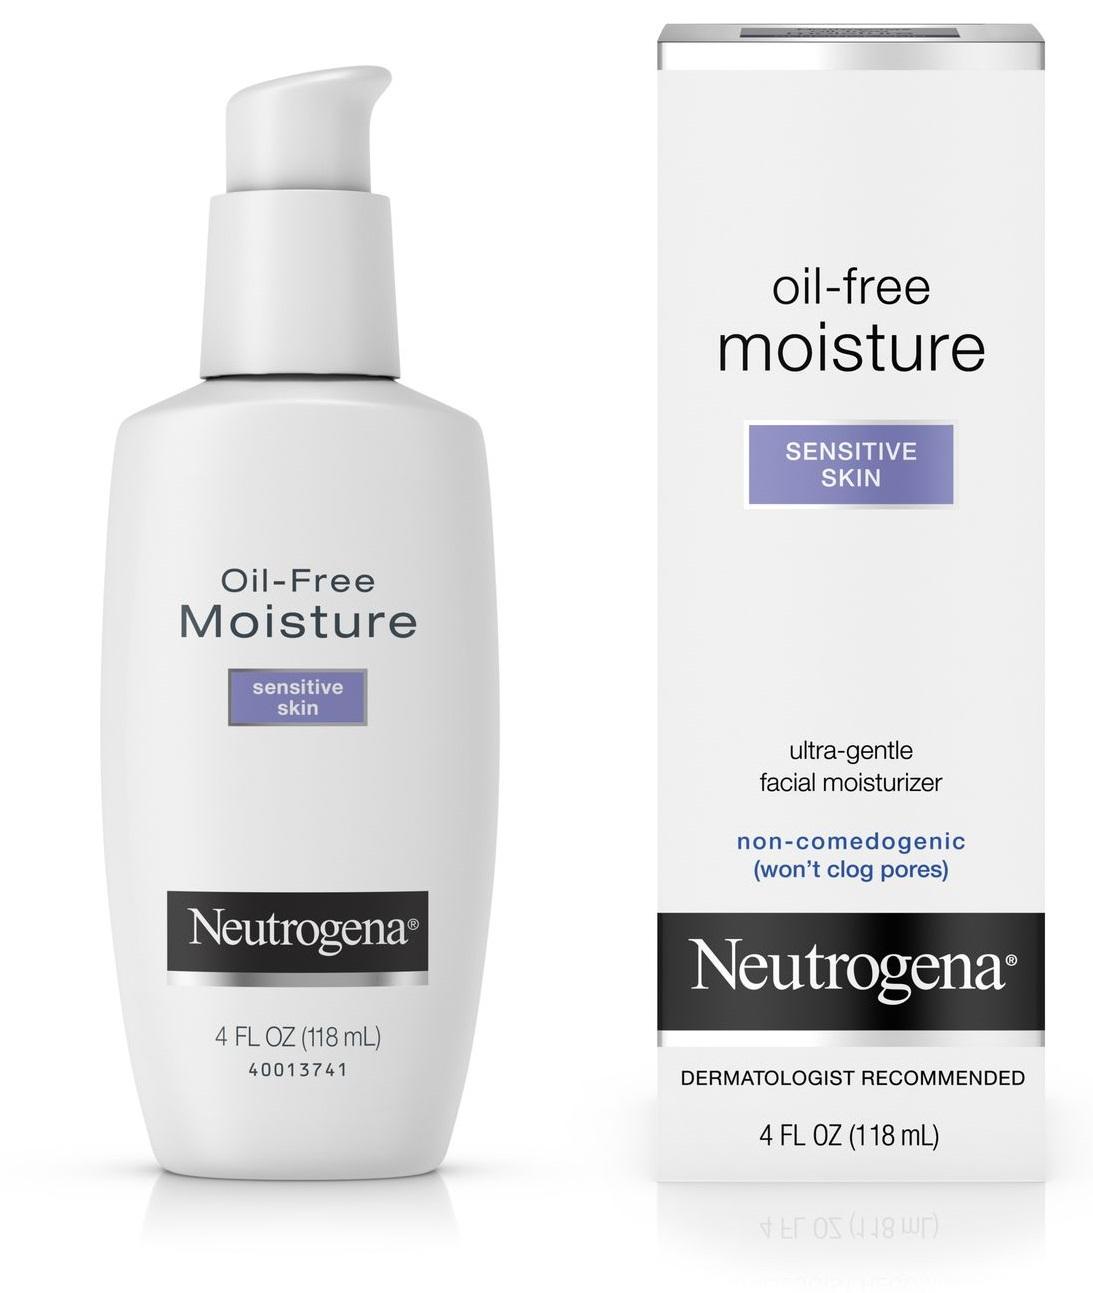 Neutrogena® Oil-Free Moisture-Sensitive Skin